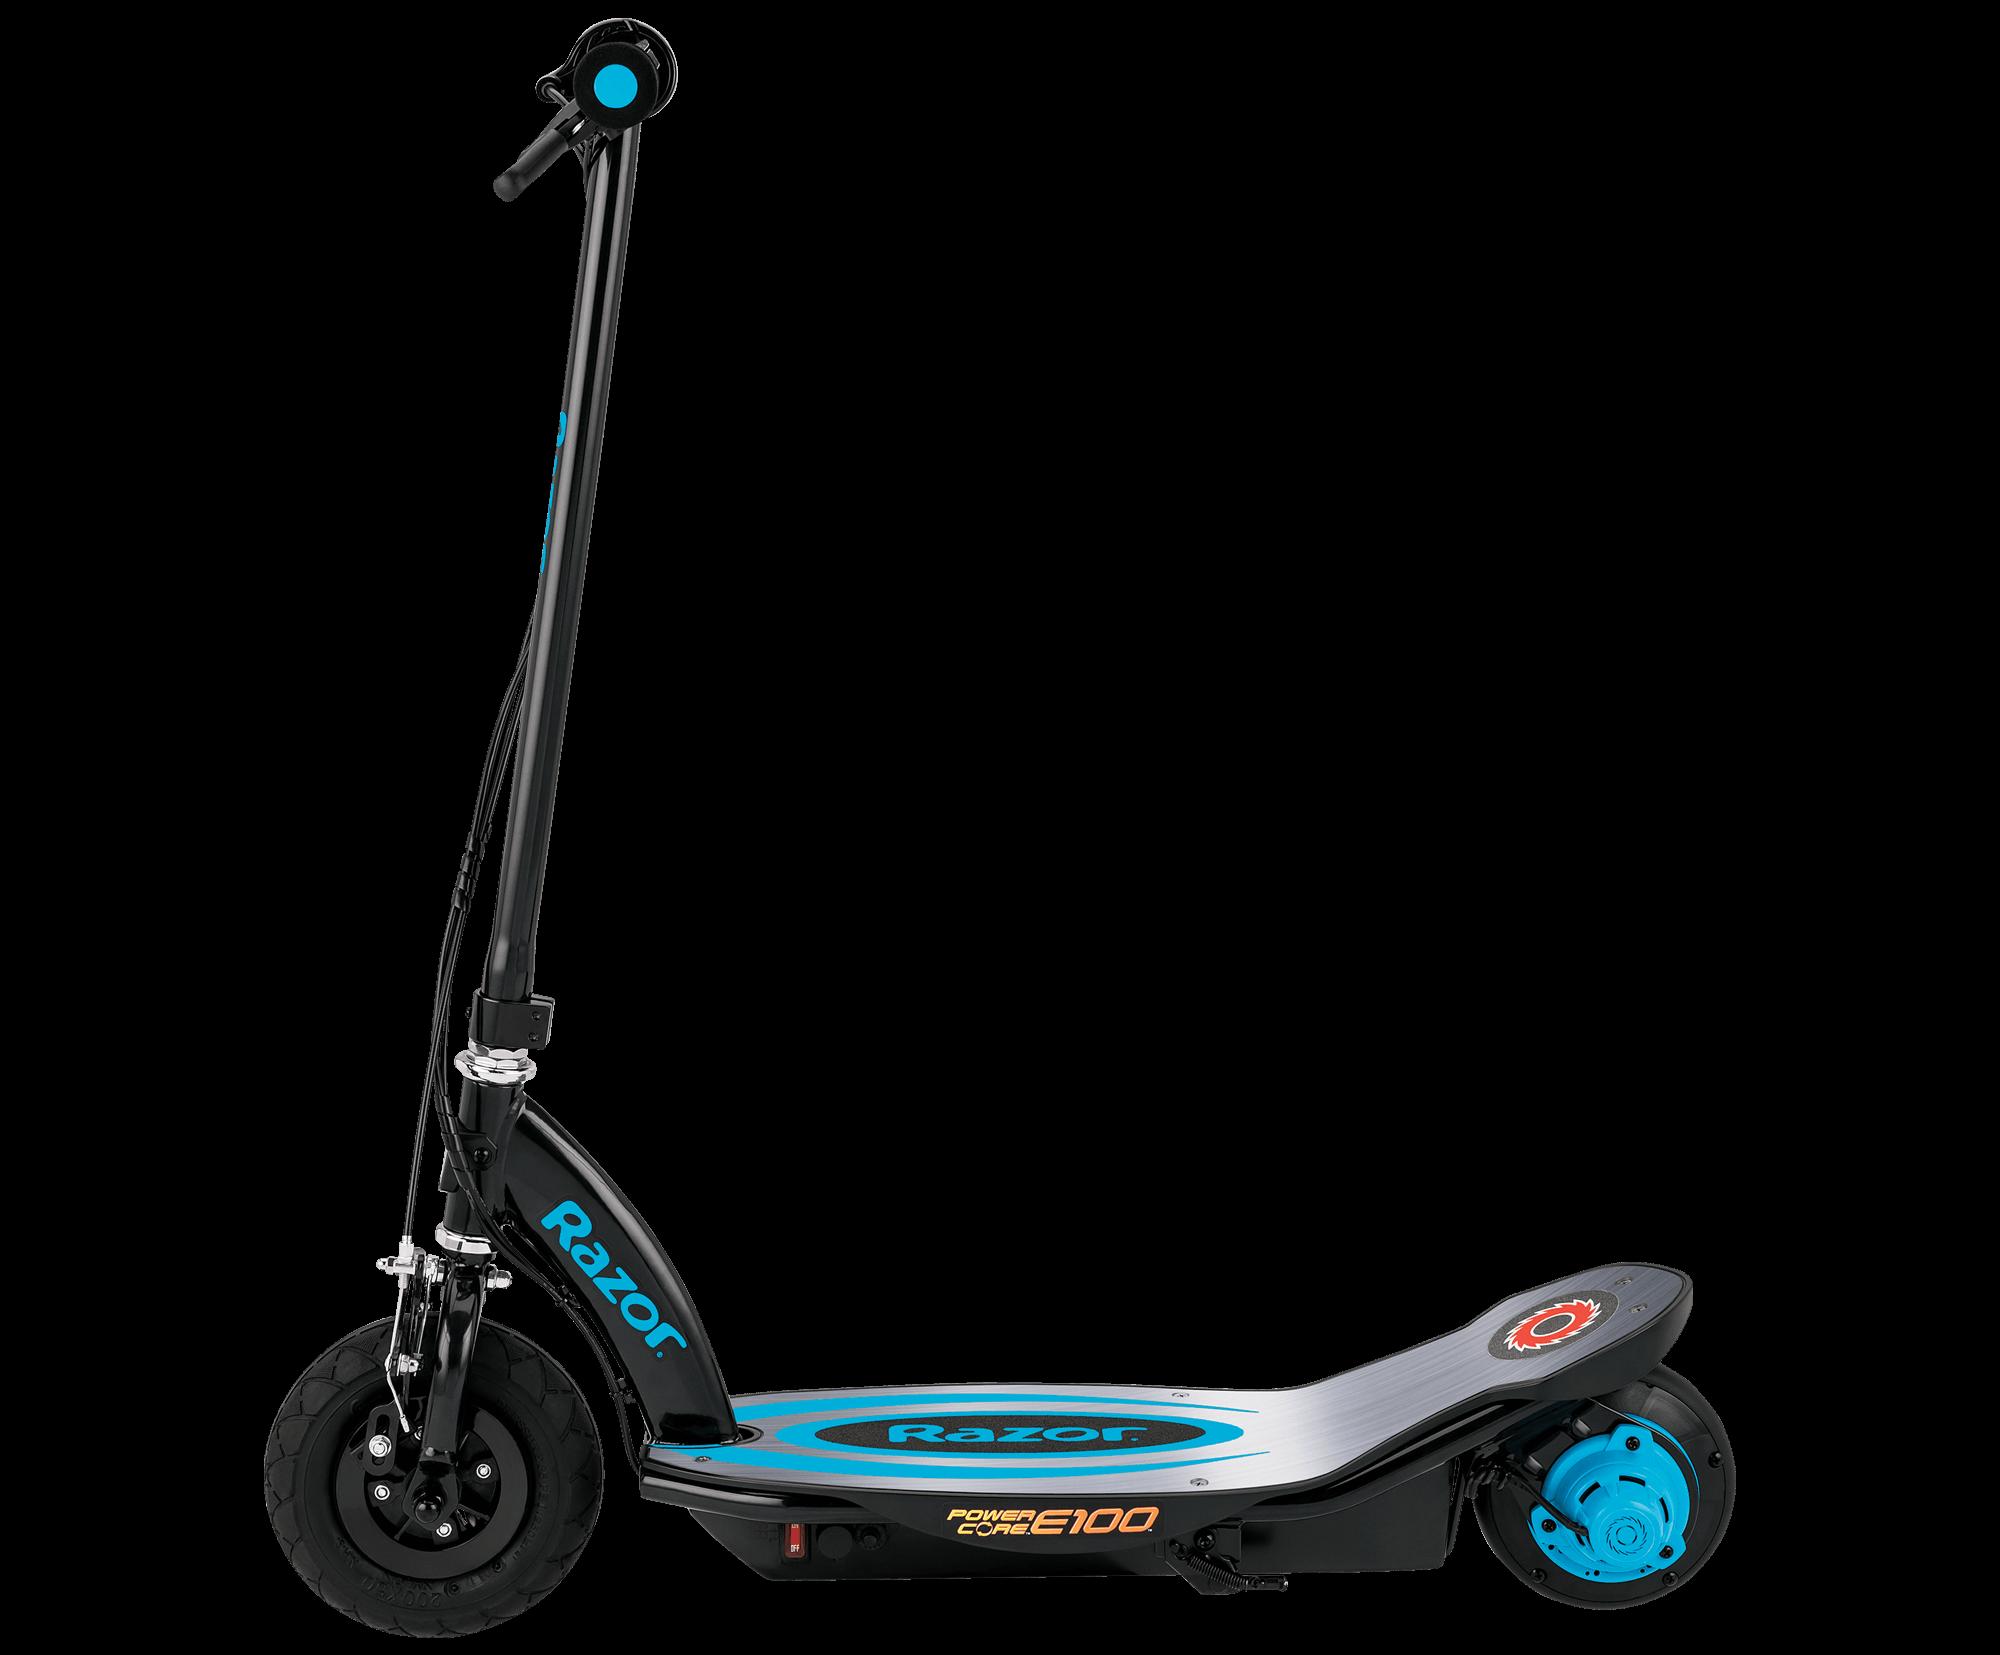 razor e100 electric scooter wiring diagram ski doo diagrams for mx350 dirt rocket